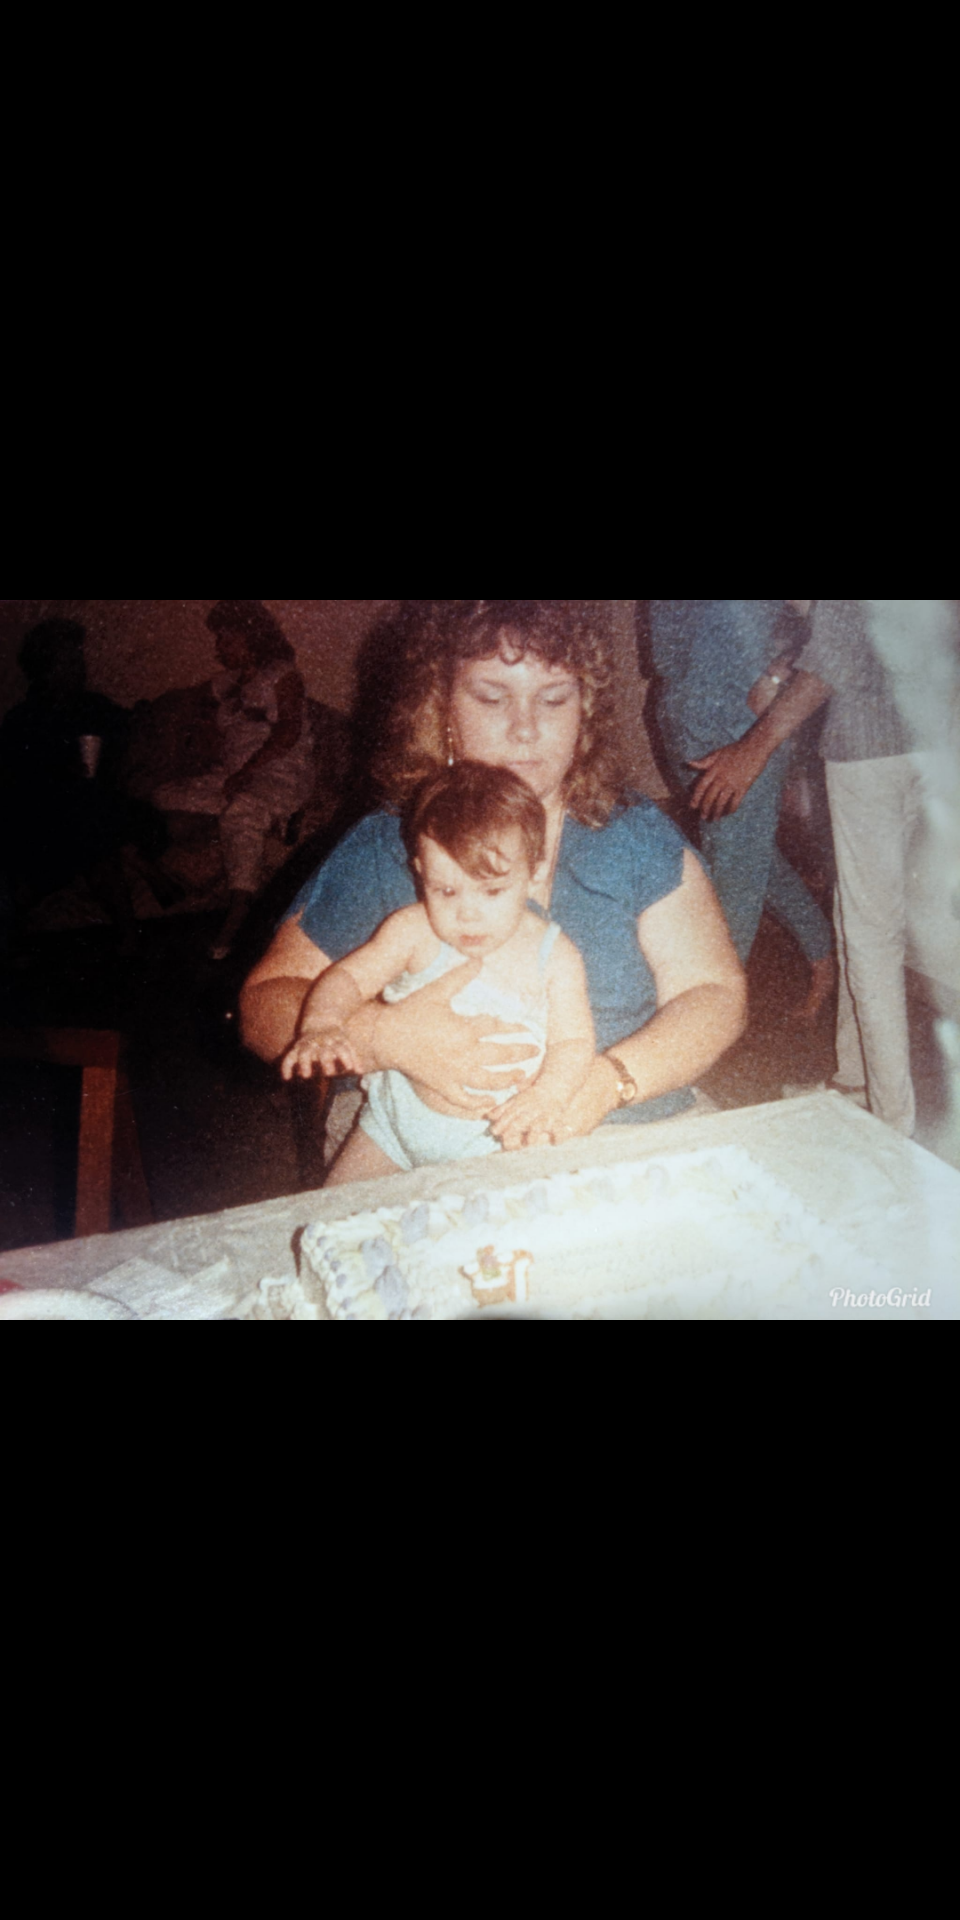 Dominique and Aunt Rhonda<br /> 1985